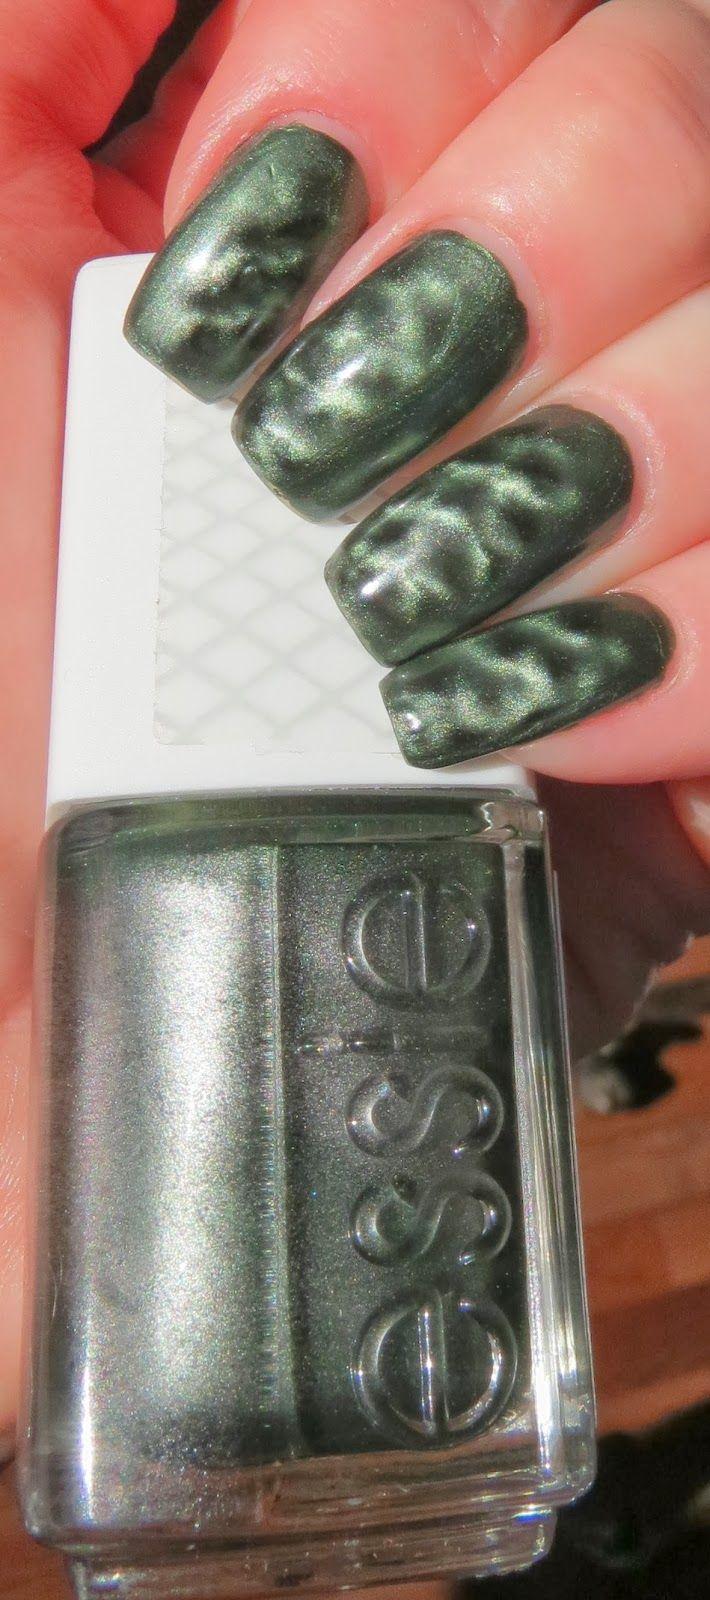 Crocadilly Essie Manicure #Essie #Crocadilly #Manicure #NailPolish #Nails #MagneticPolish #GreenNails #ItsNotEasyBeingGreen #NailArt #fun #MagneticPolishTips